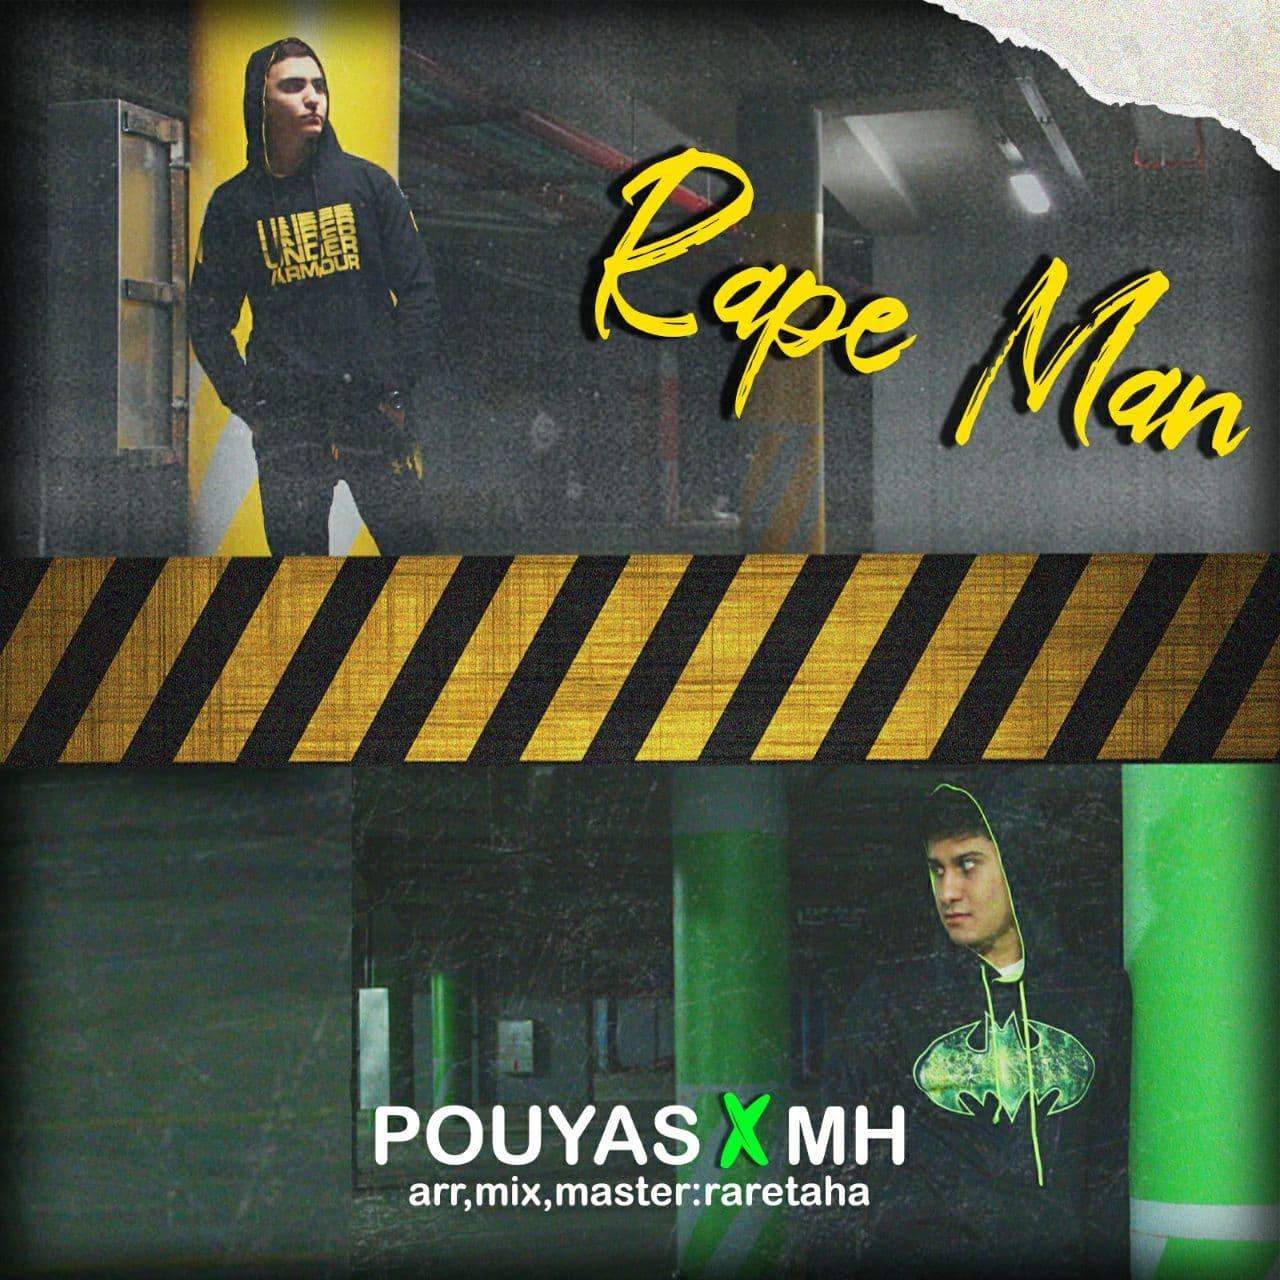 Pouyas x Mohamad Mh – Rape Man